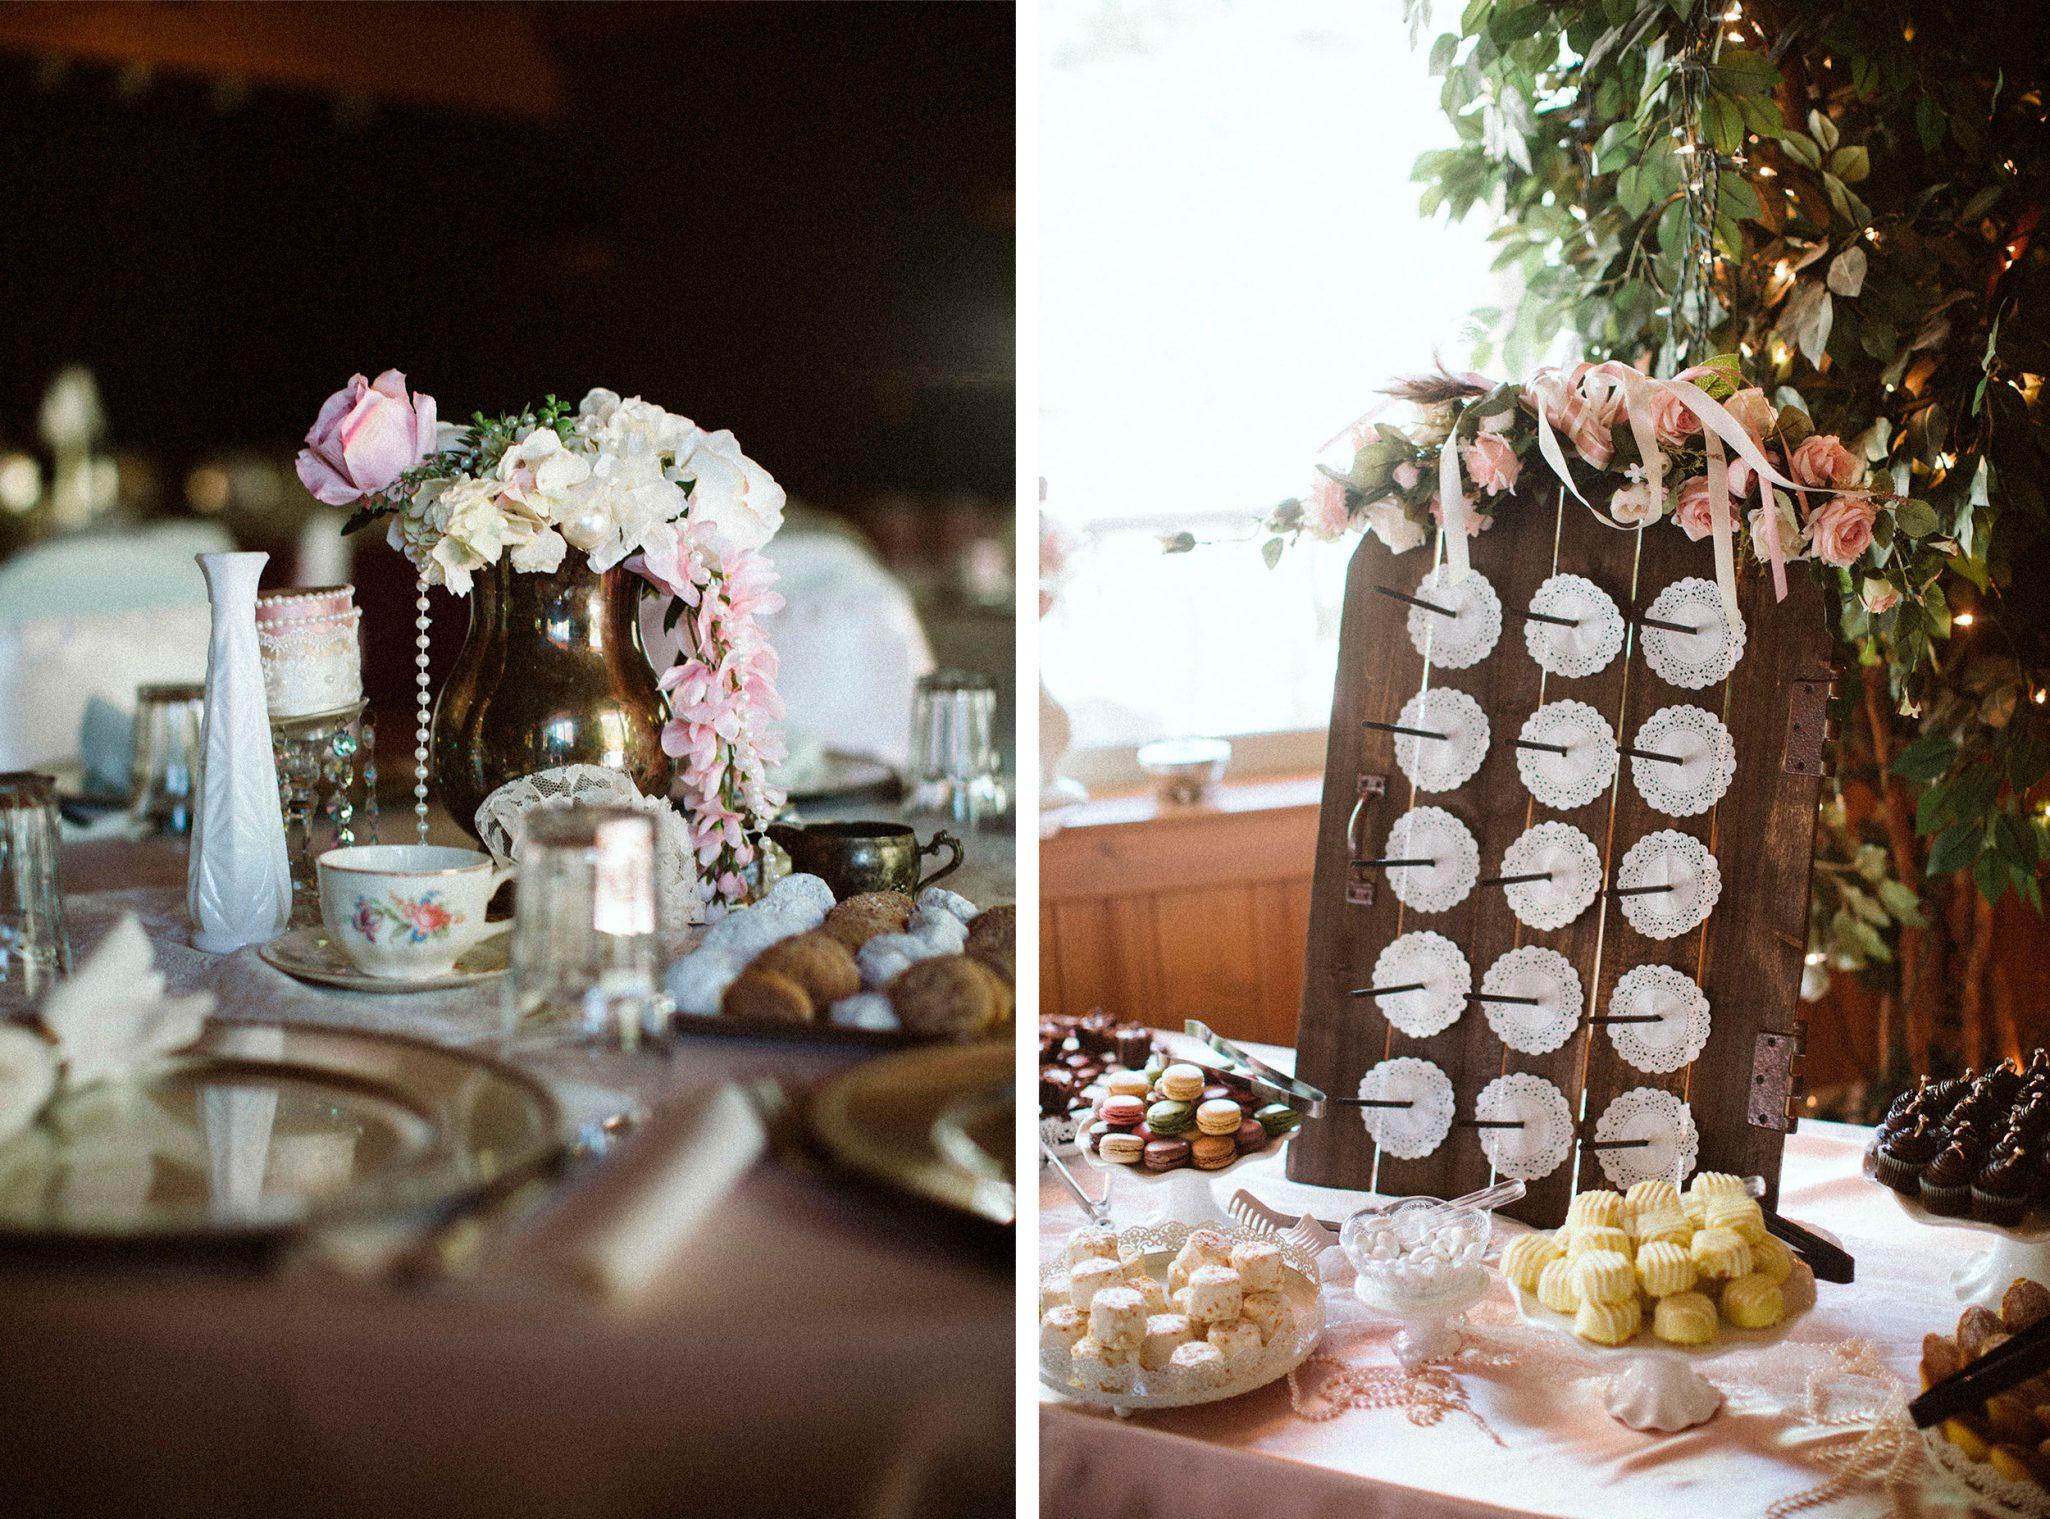 Classic vintage wedding decor